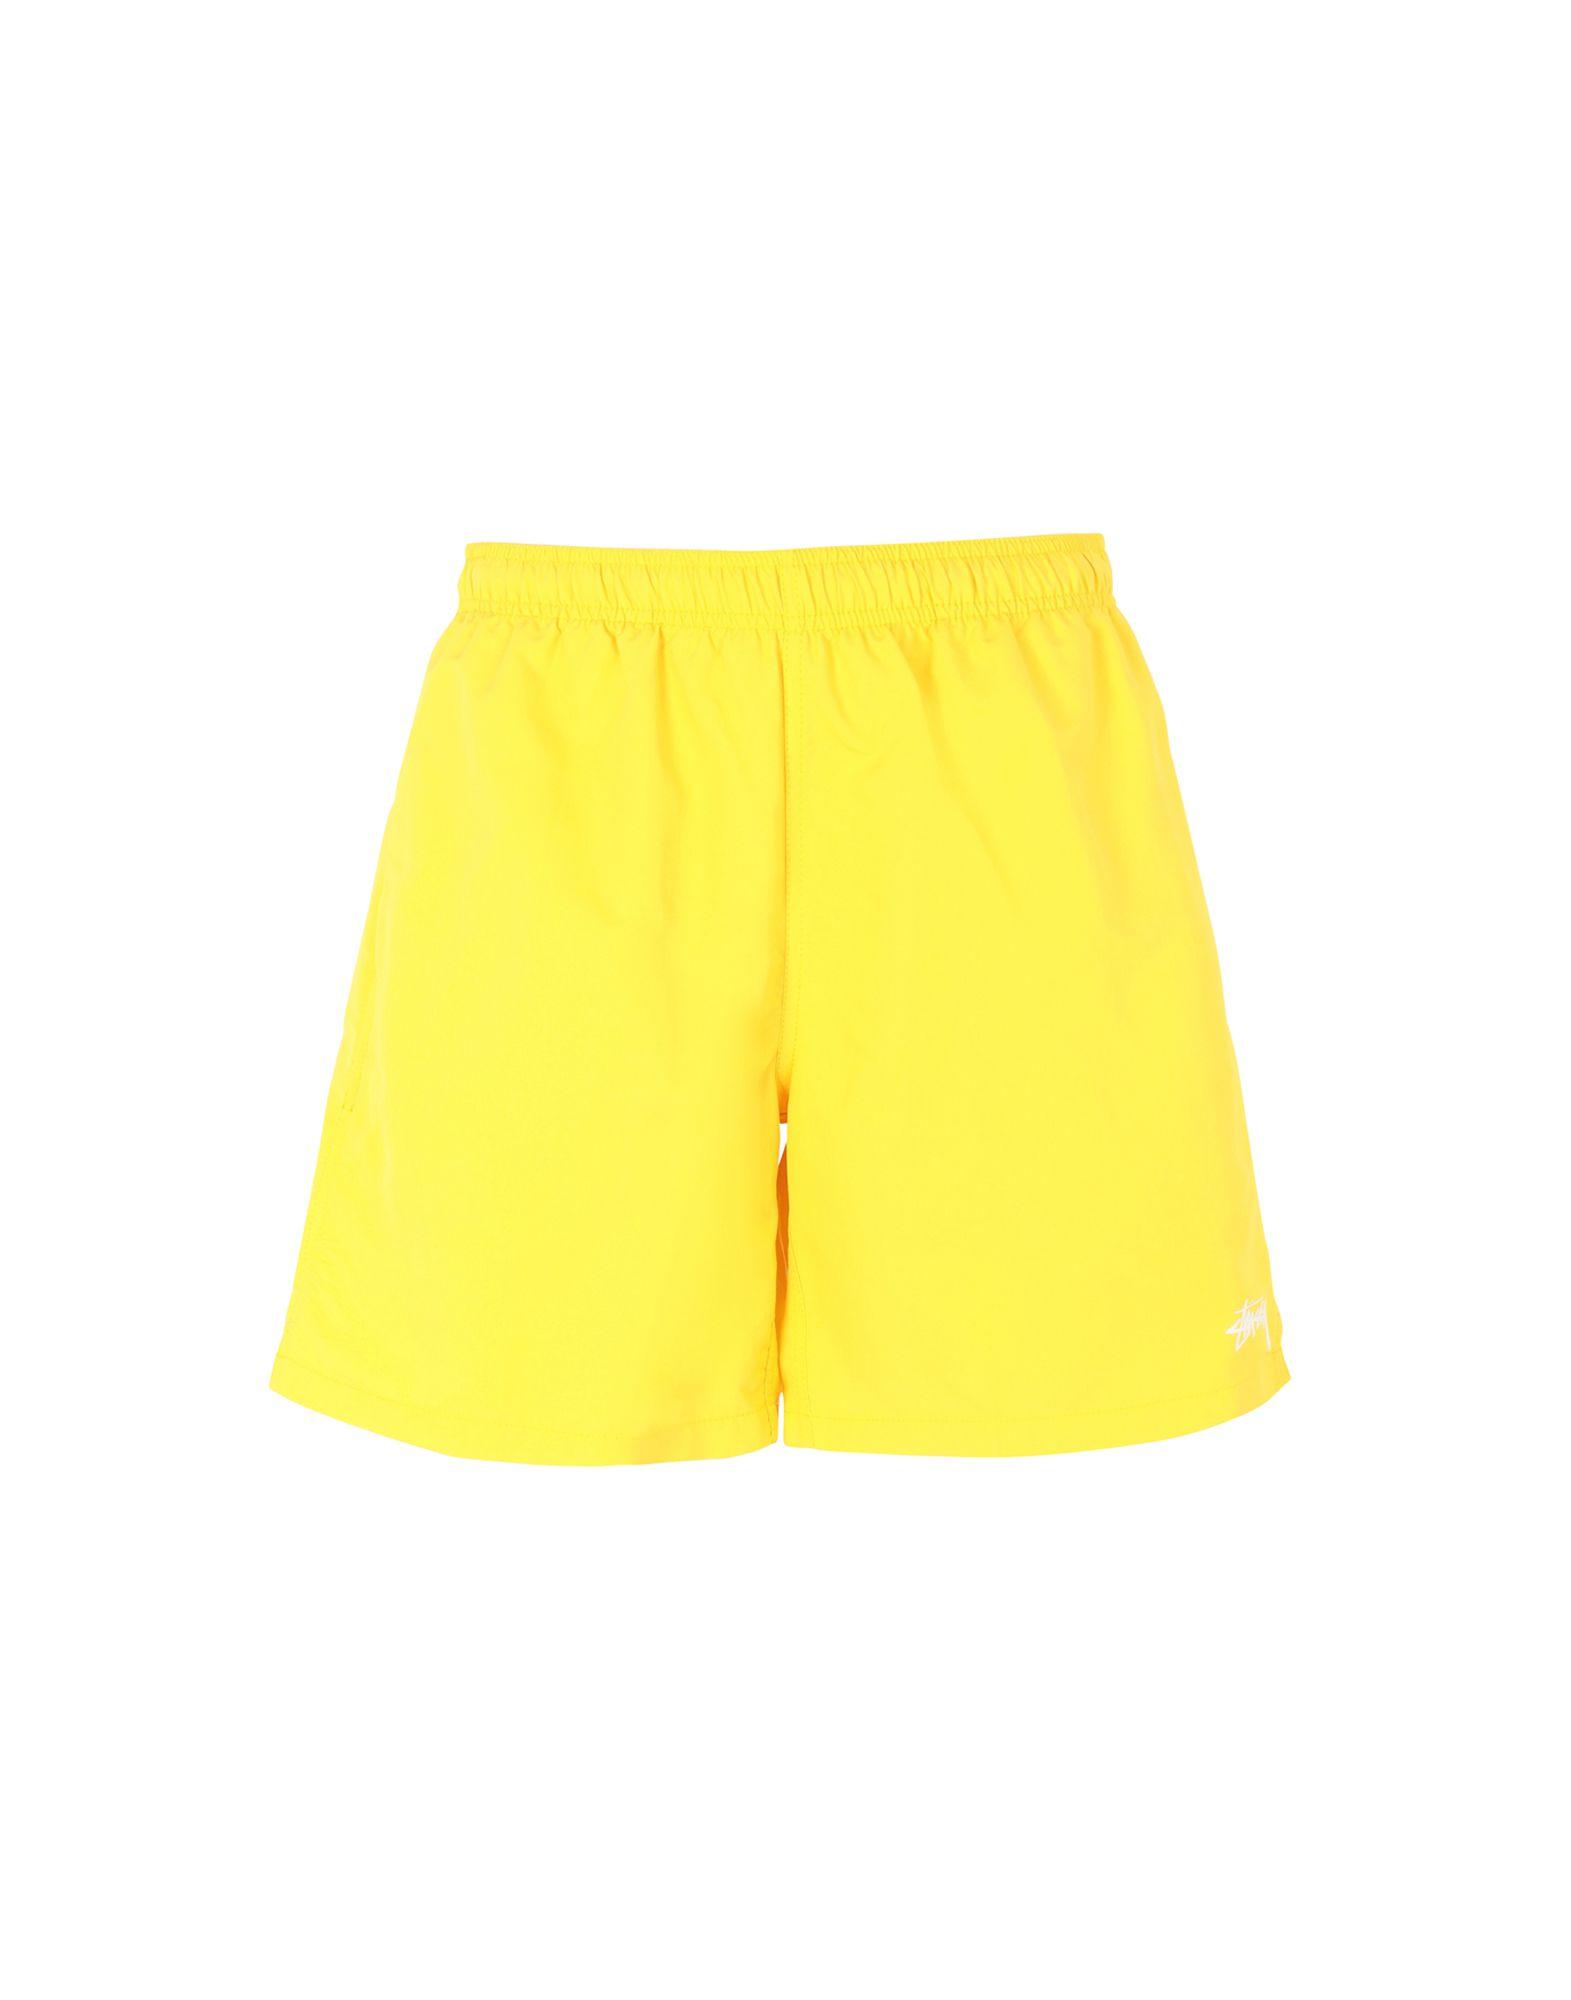 Stussy Swim Trunks With Logo In Yellow (yellow)